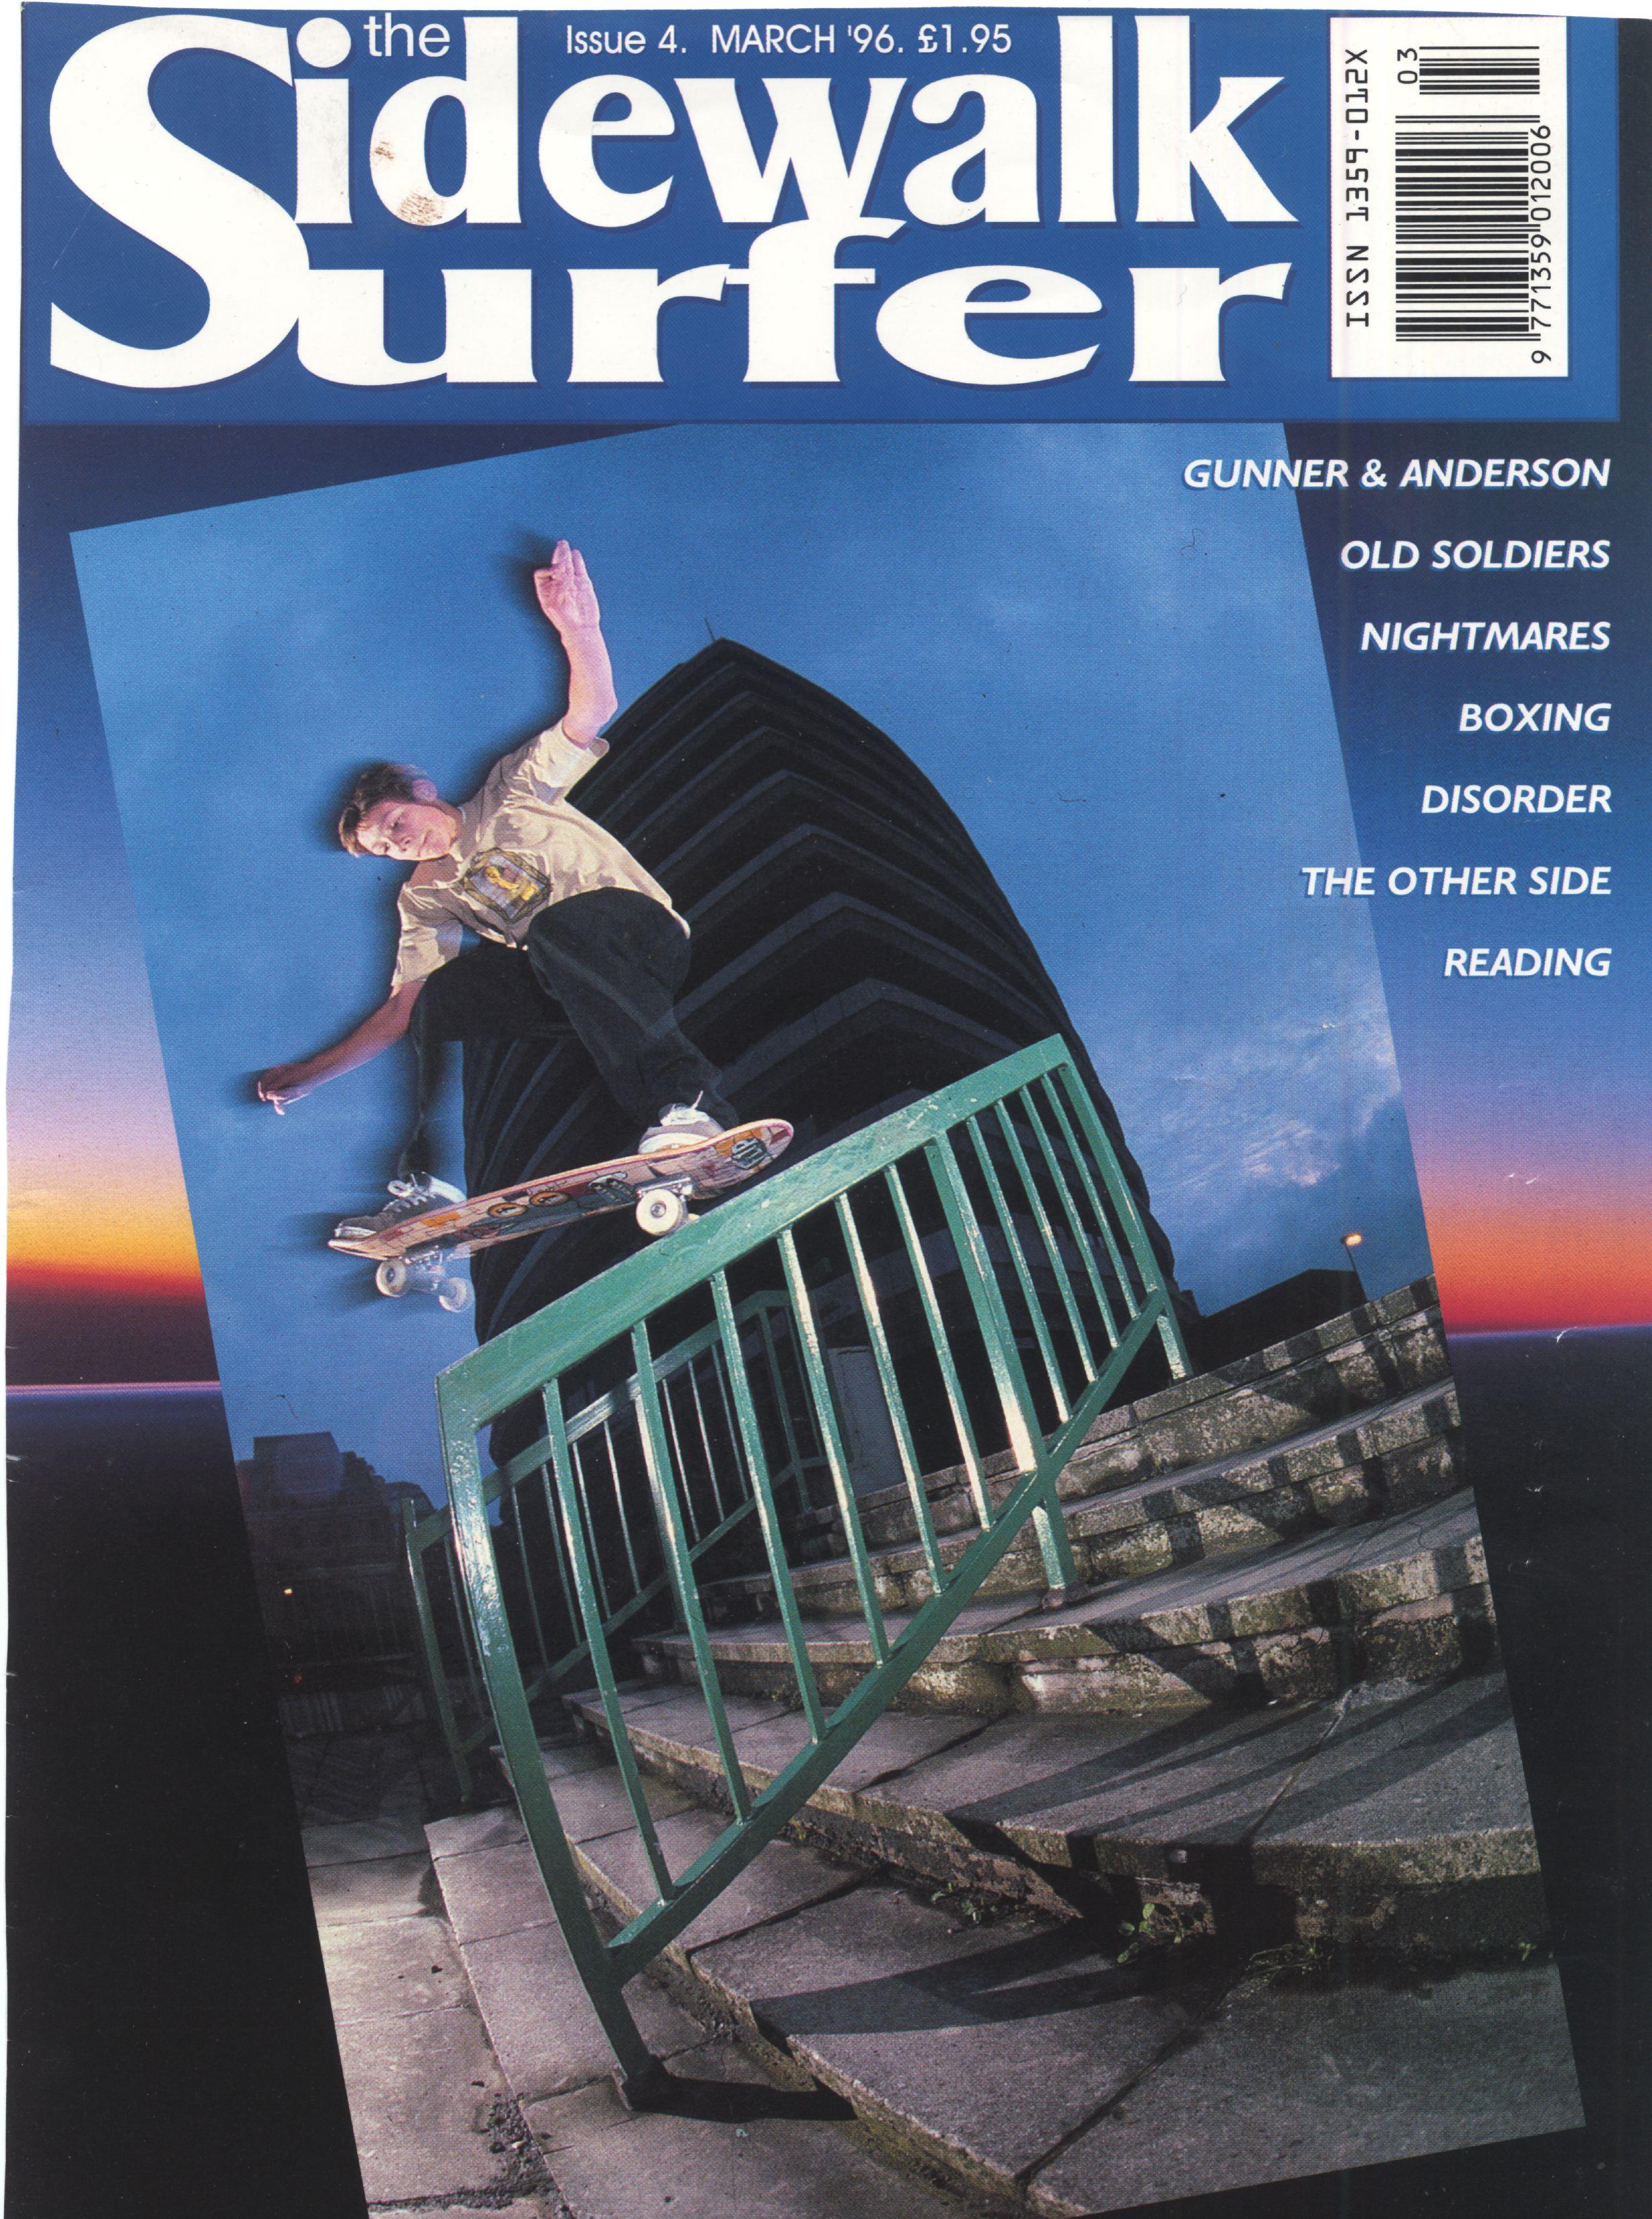 3 Sidewalk Surfer cover